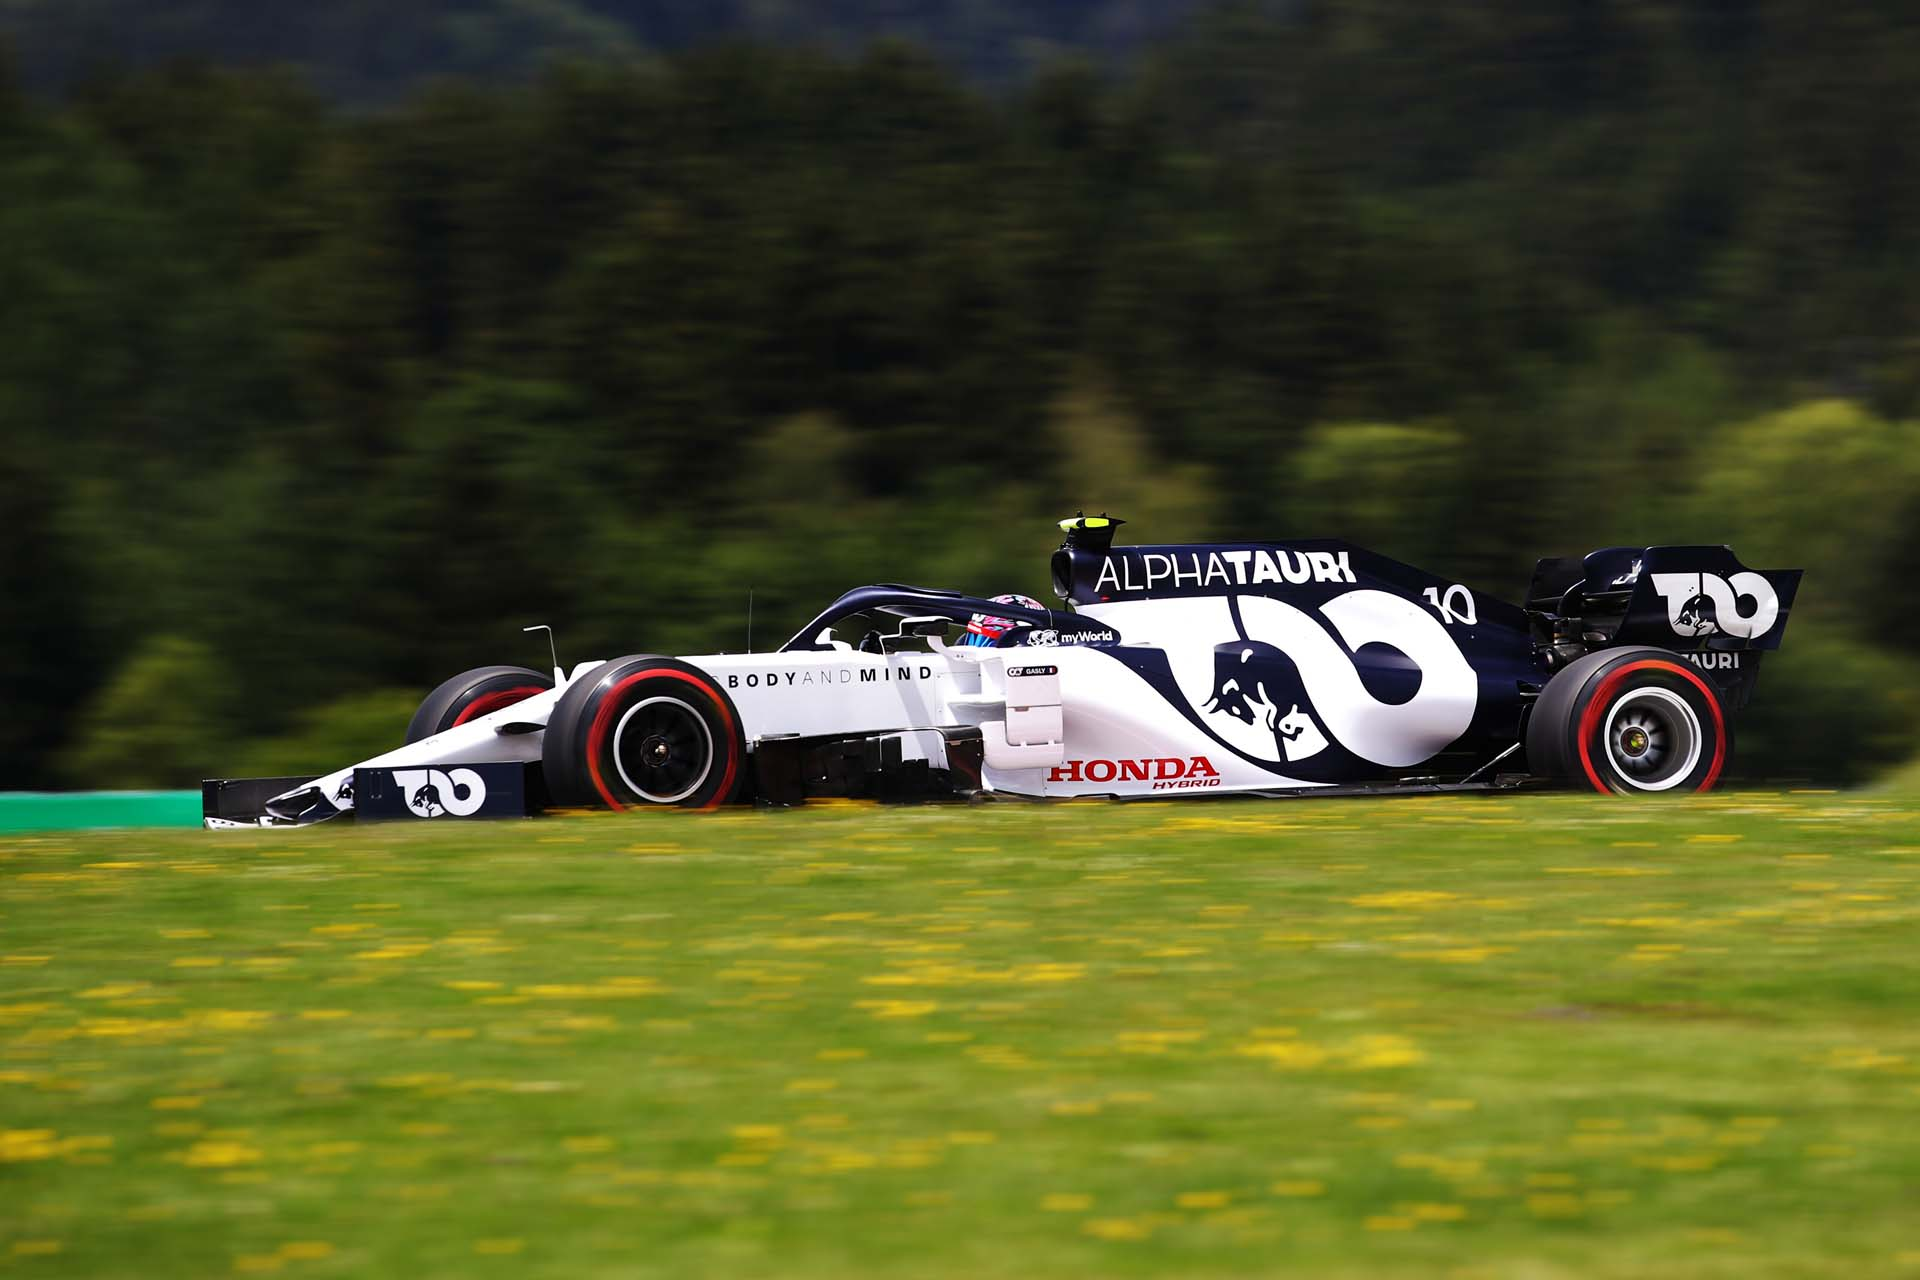 F1 Grand Prix of Austria - Final Practice